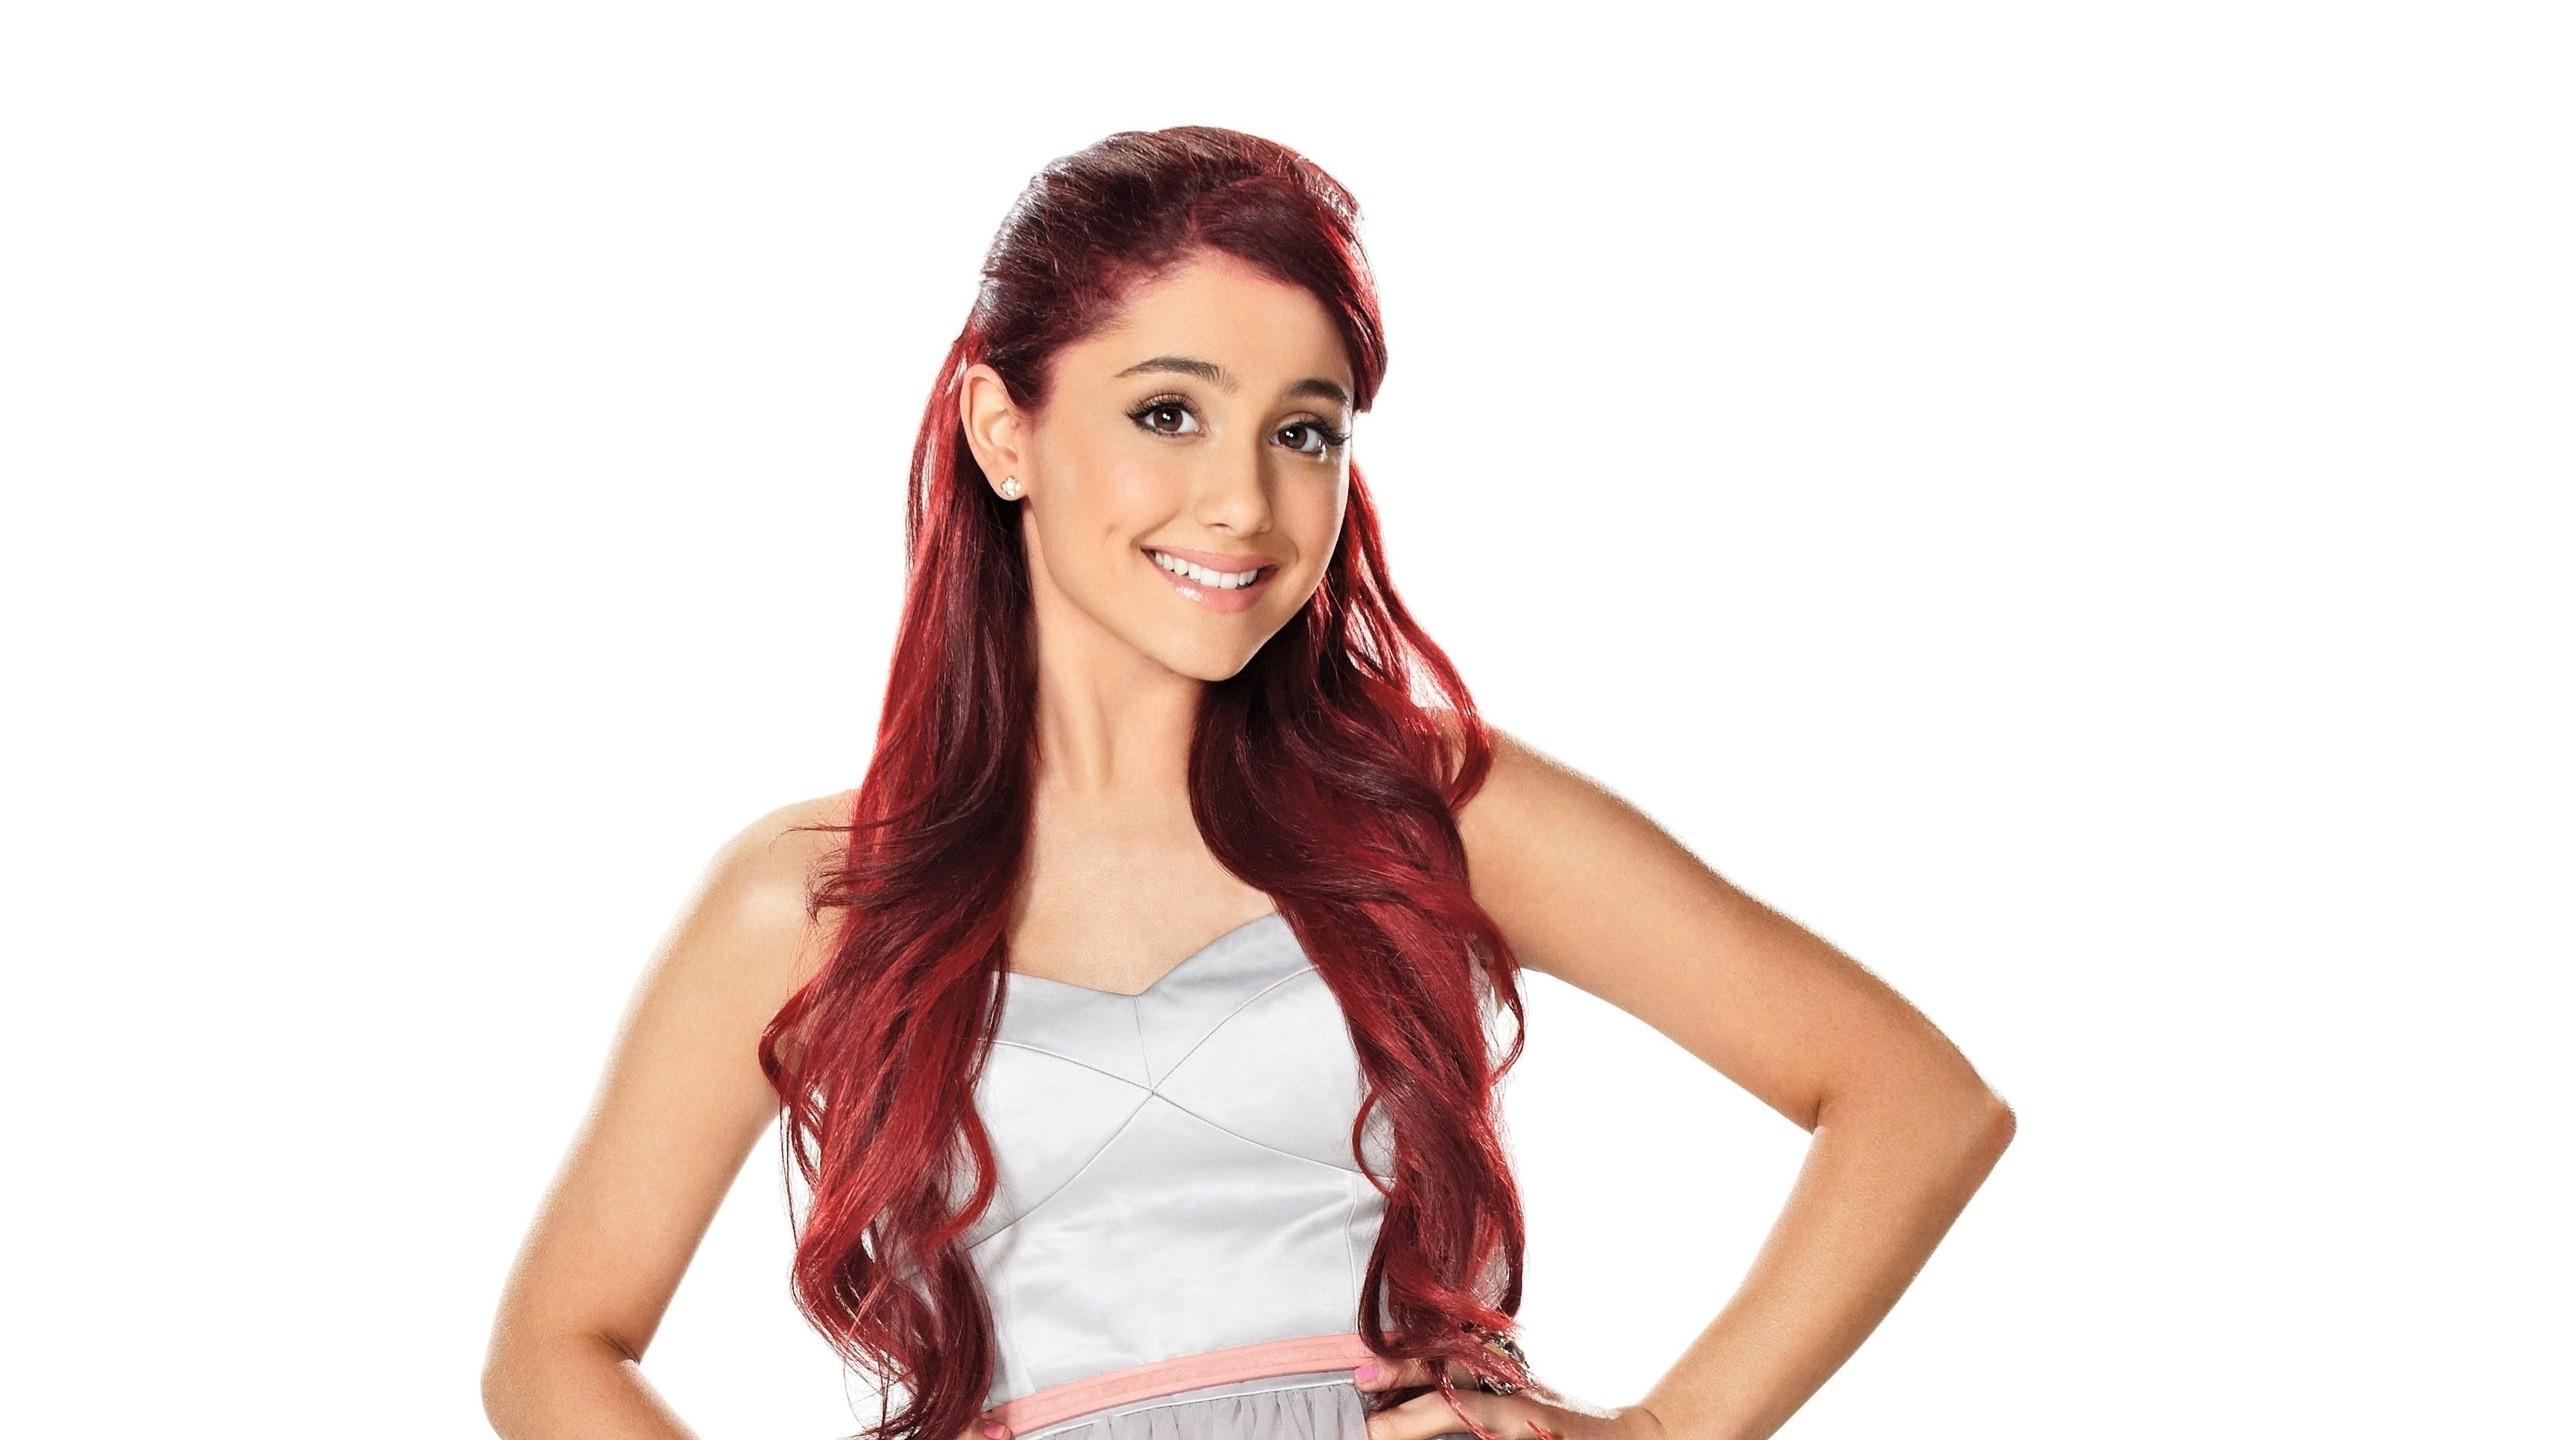 Wallpaper Of Cute Barbie Girl Ariana Grande Hd Wallpapers Hd Wallpapers Id 17163